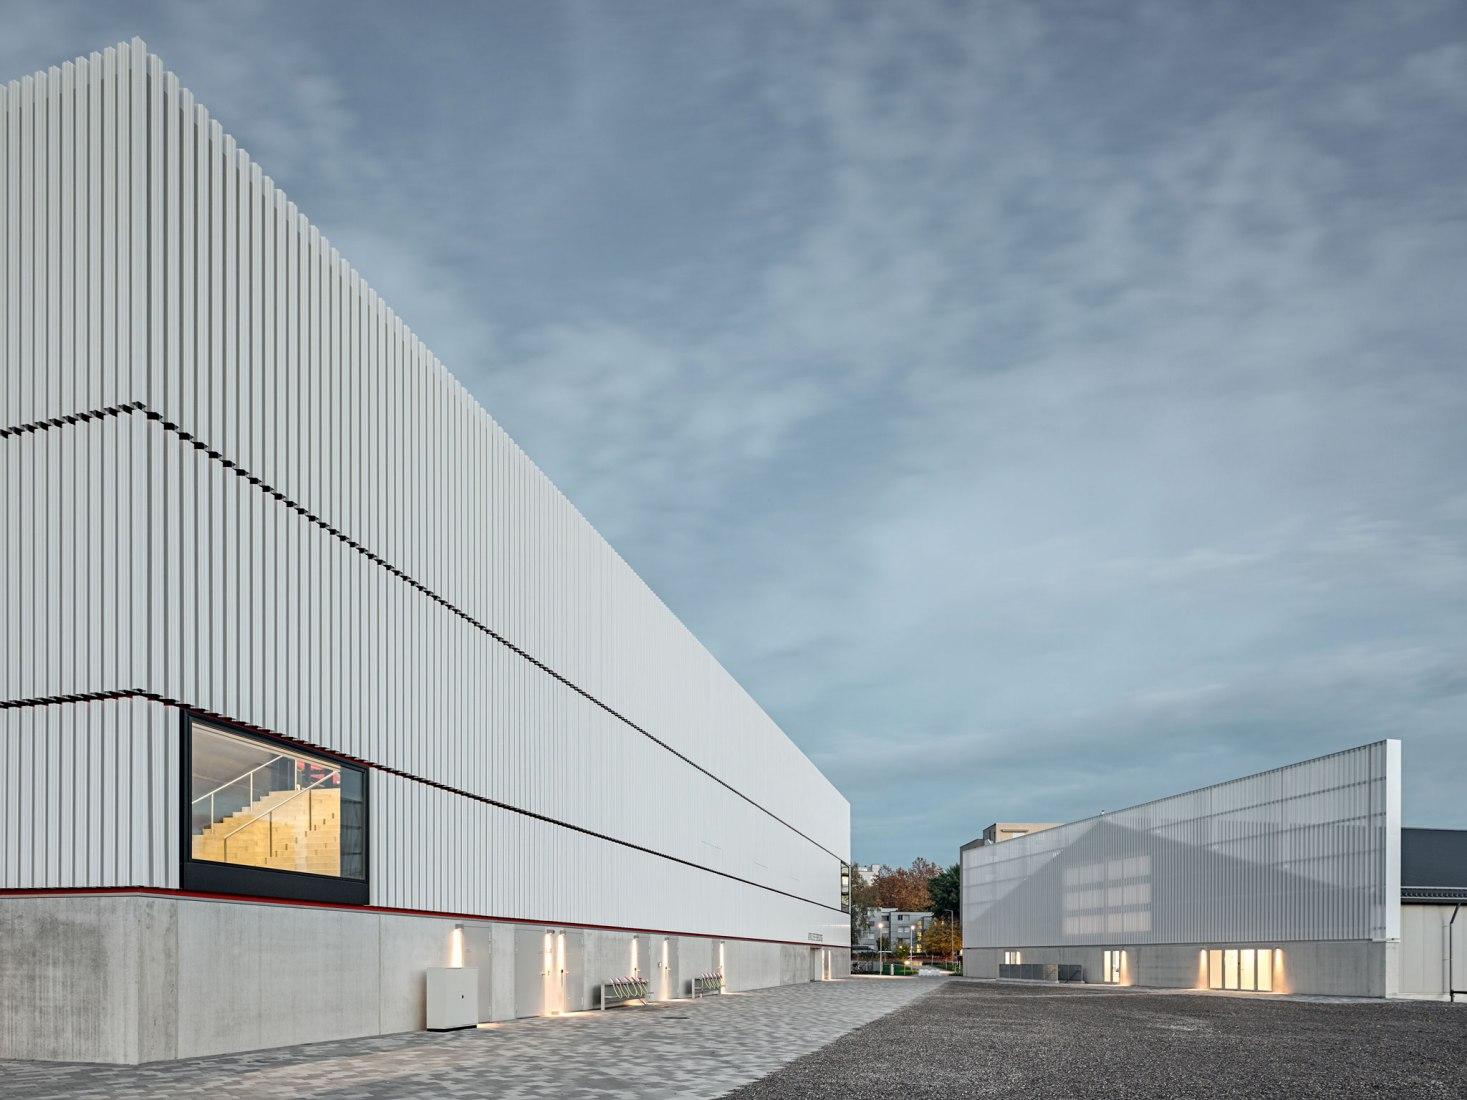 WIN4 Centro deportivo por EM2N. Fotografía por Roger Frei